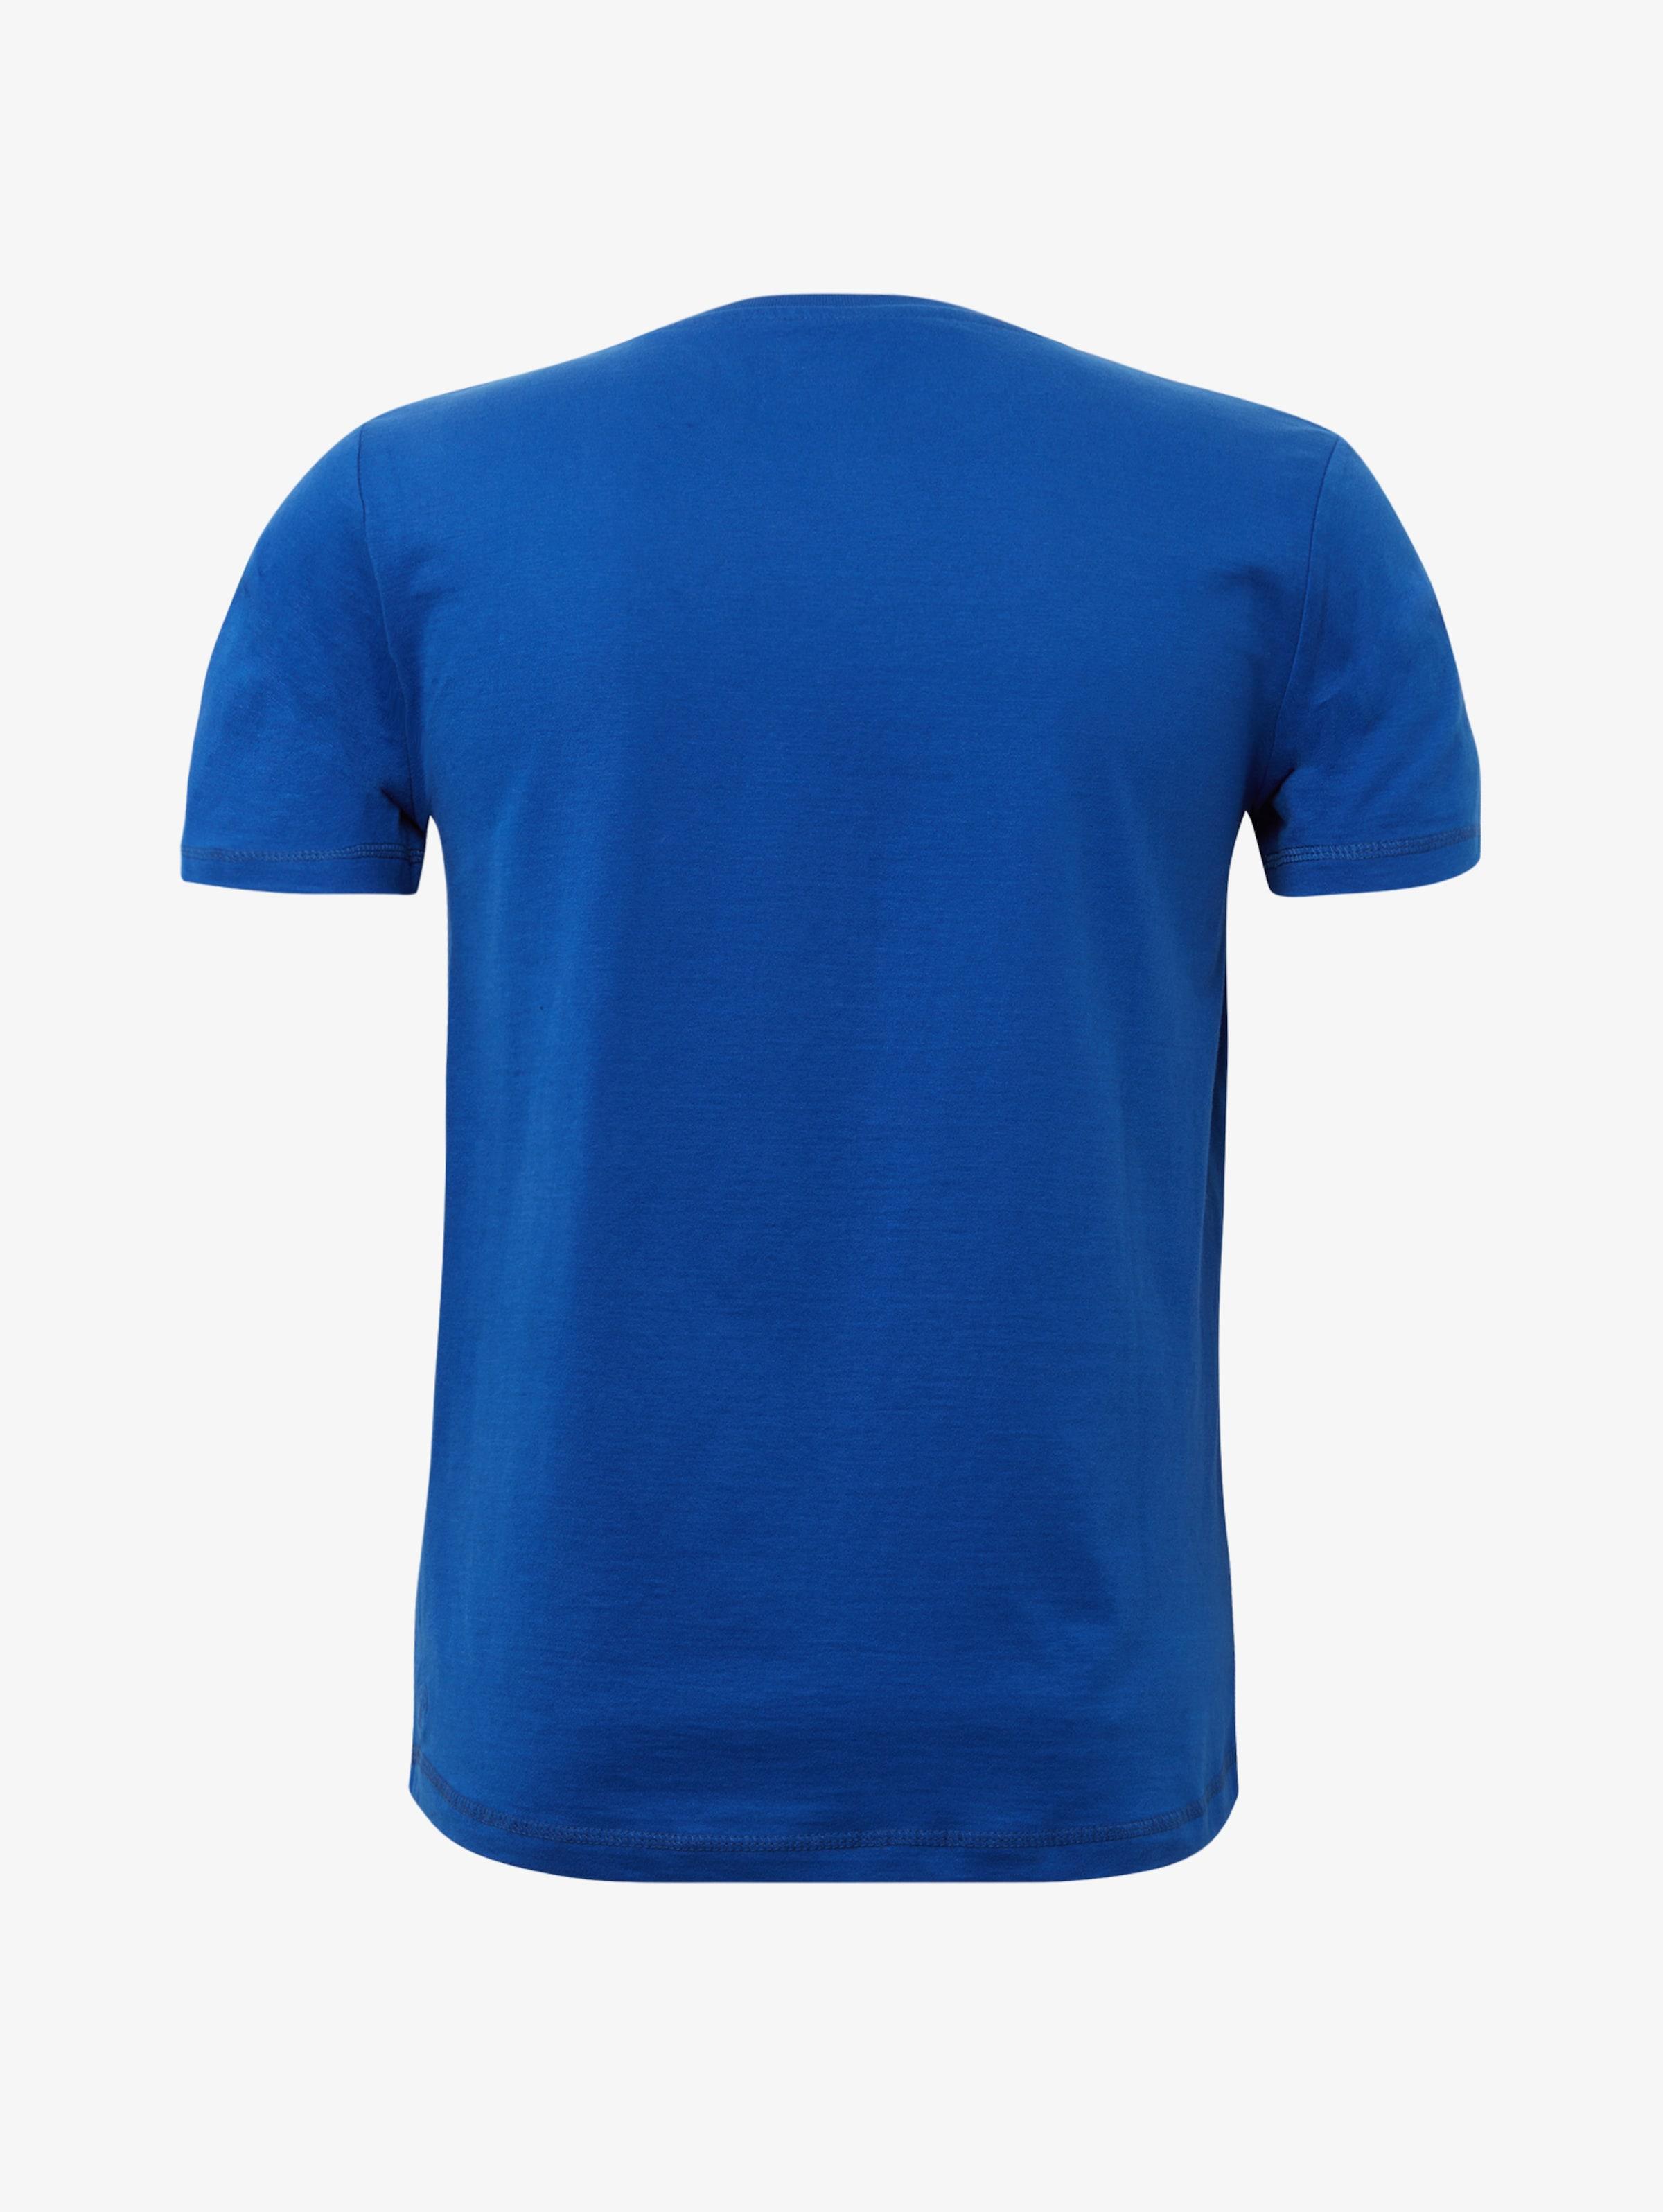 shirt Denim Tom T Schwarz Tailor In BlauHellrot mn0wOvN8